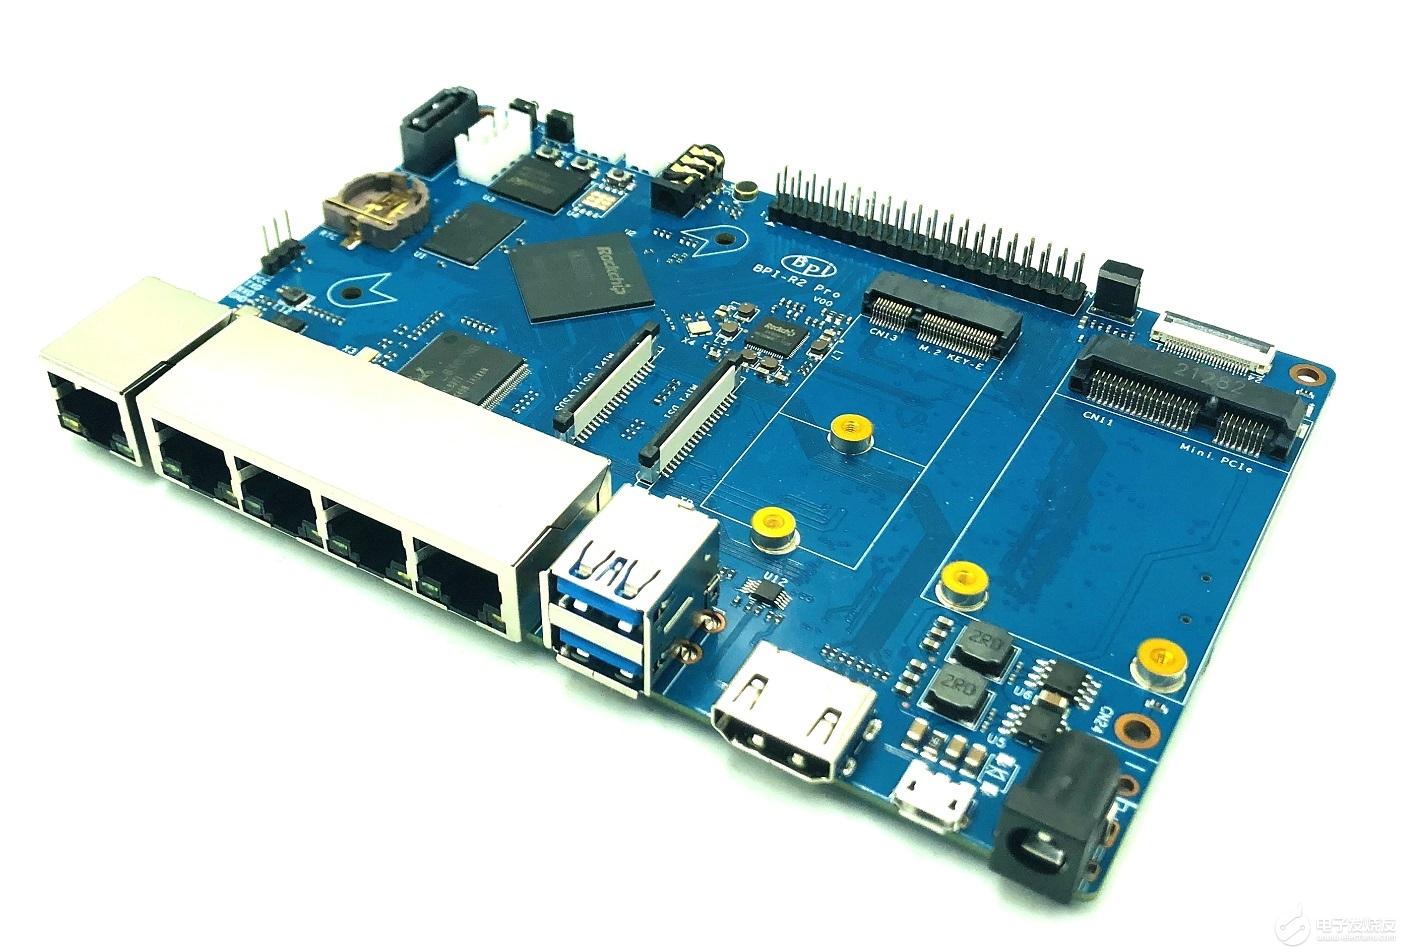 Banana Pi BPI-R2 Pro 開源路由器采用瑞芯微(Rockchip) RK3568芯片方案設計